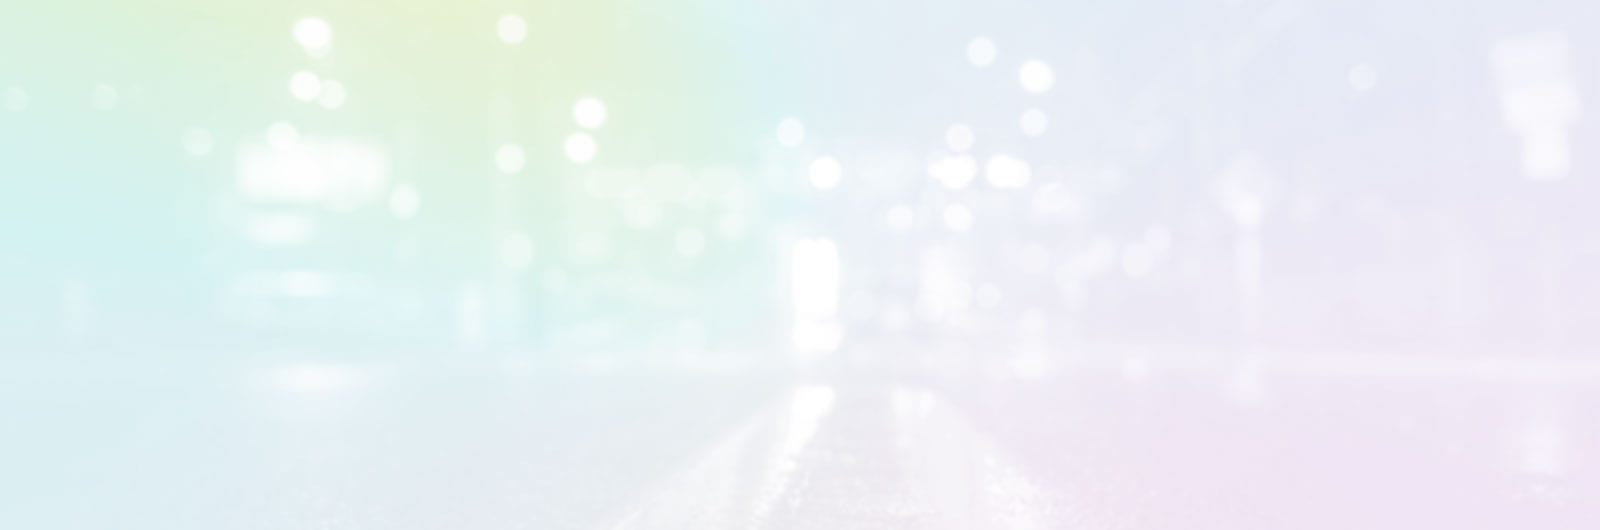 Grafenia-City-Lights-Pale-1600x530px